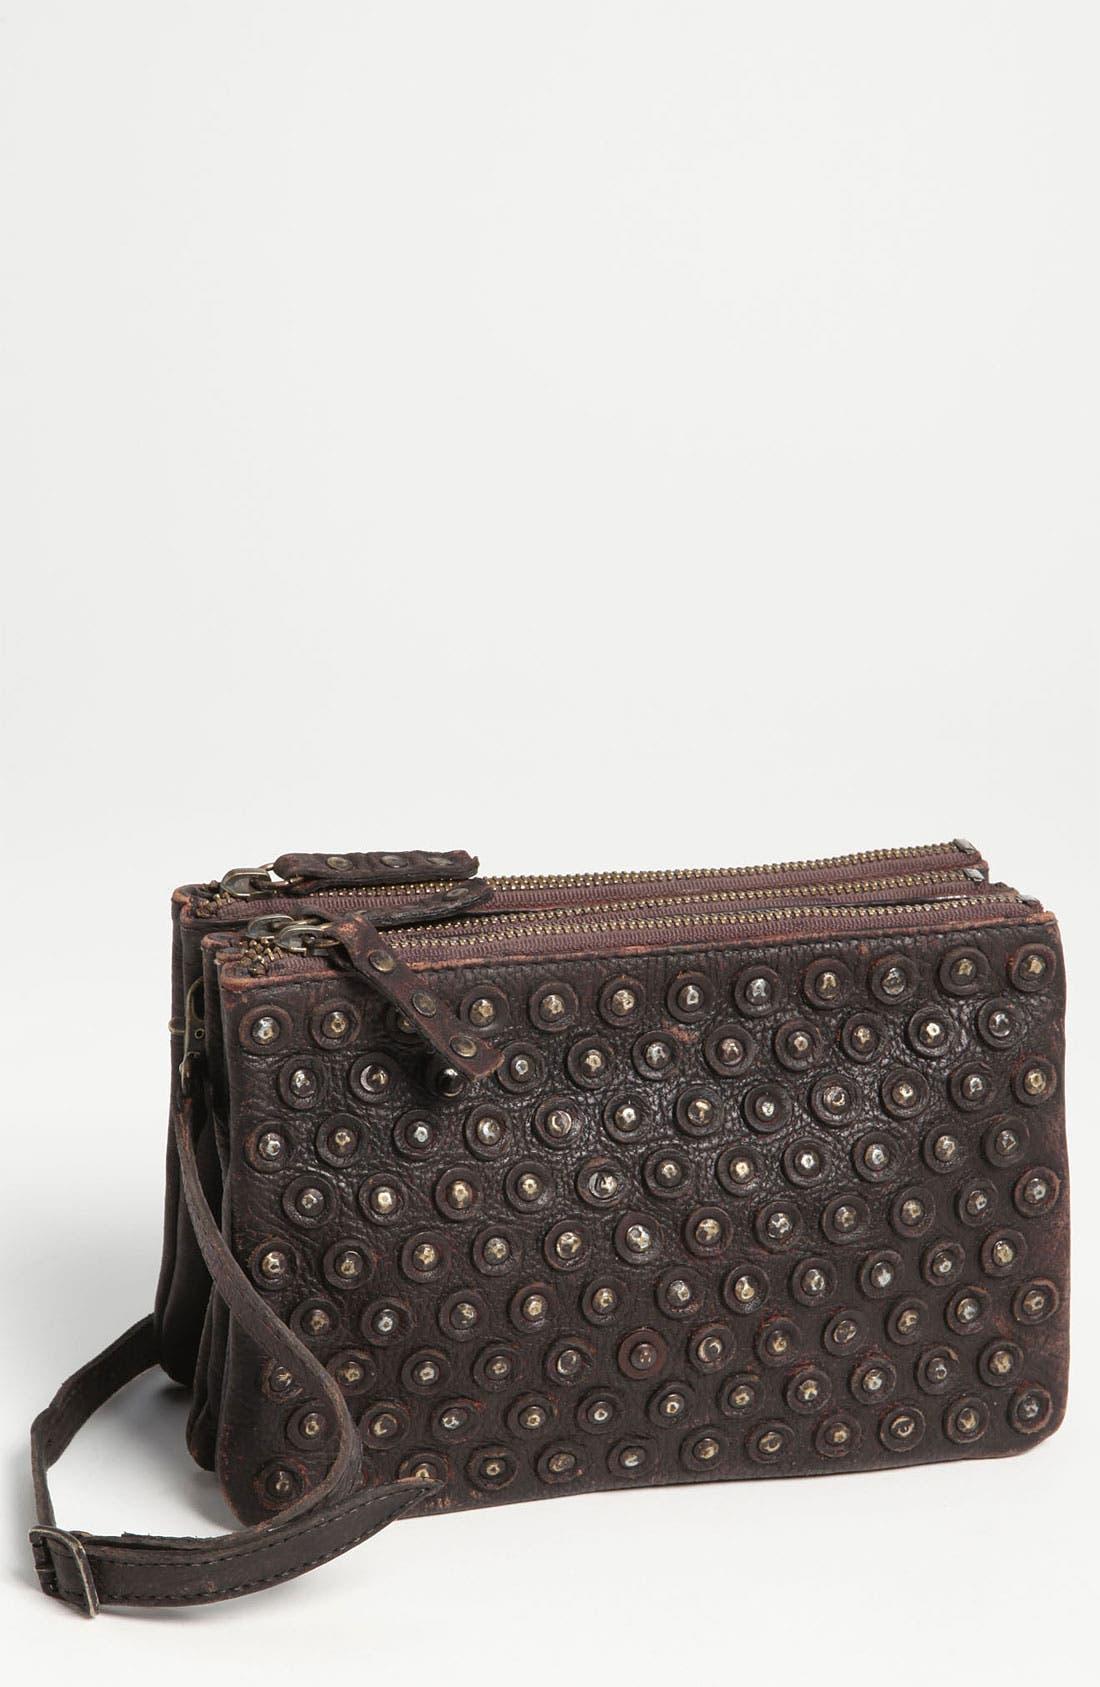 Main Image - Frye 'Jenna Disc' Crossbody Bag